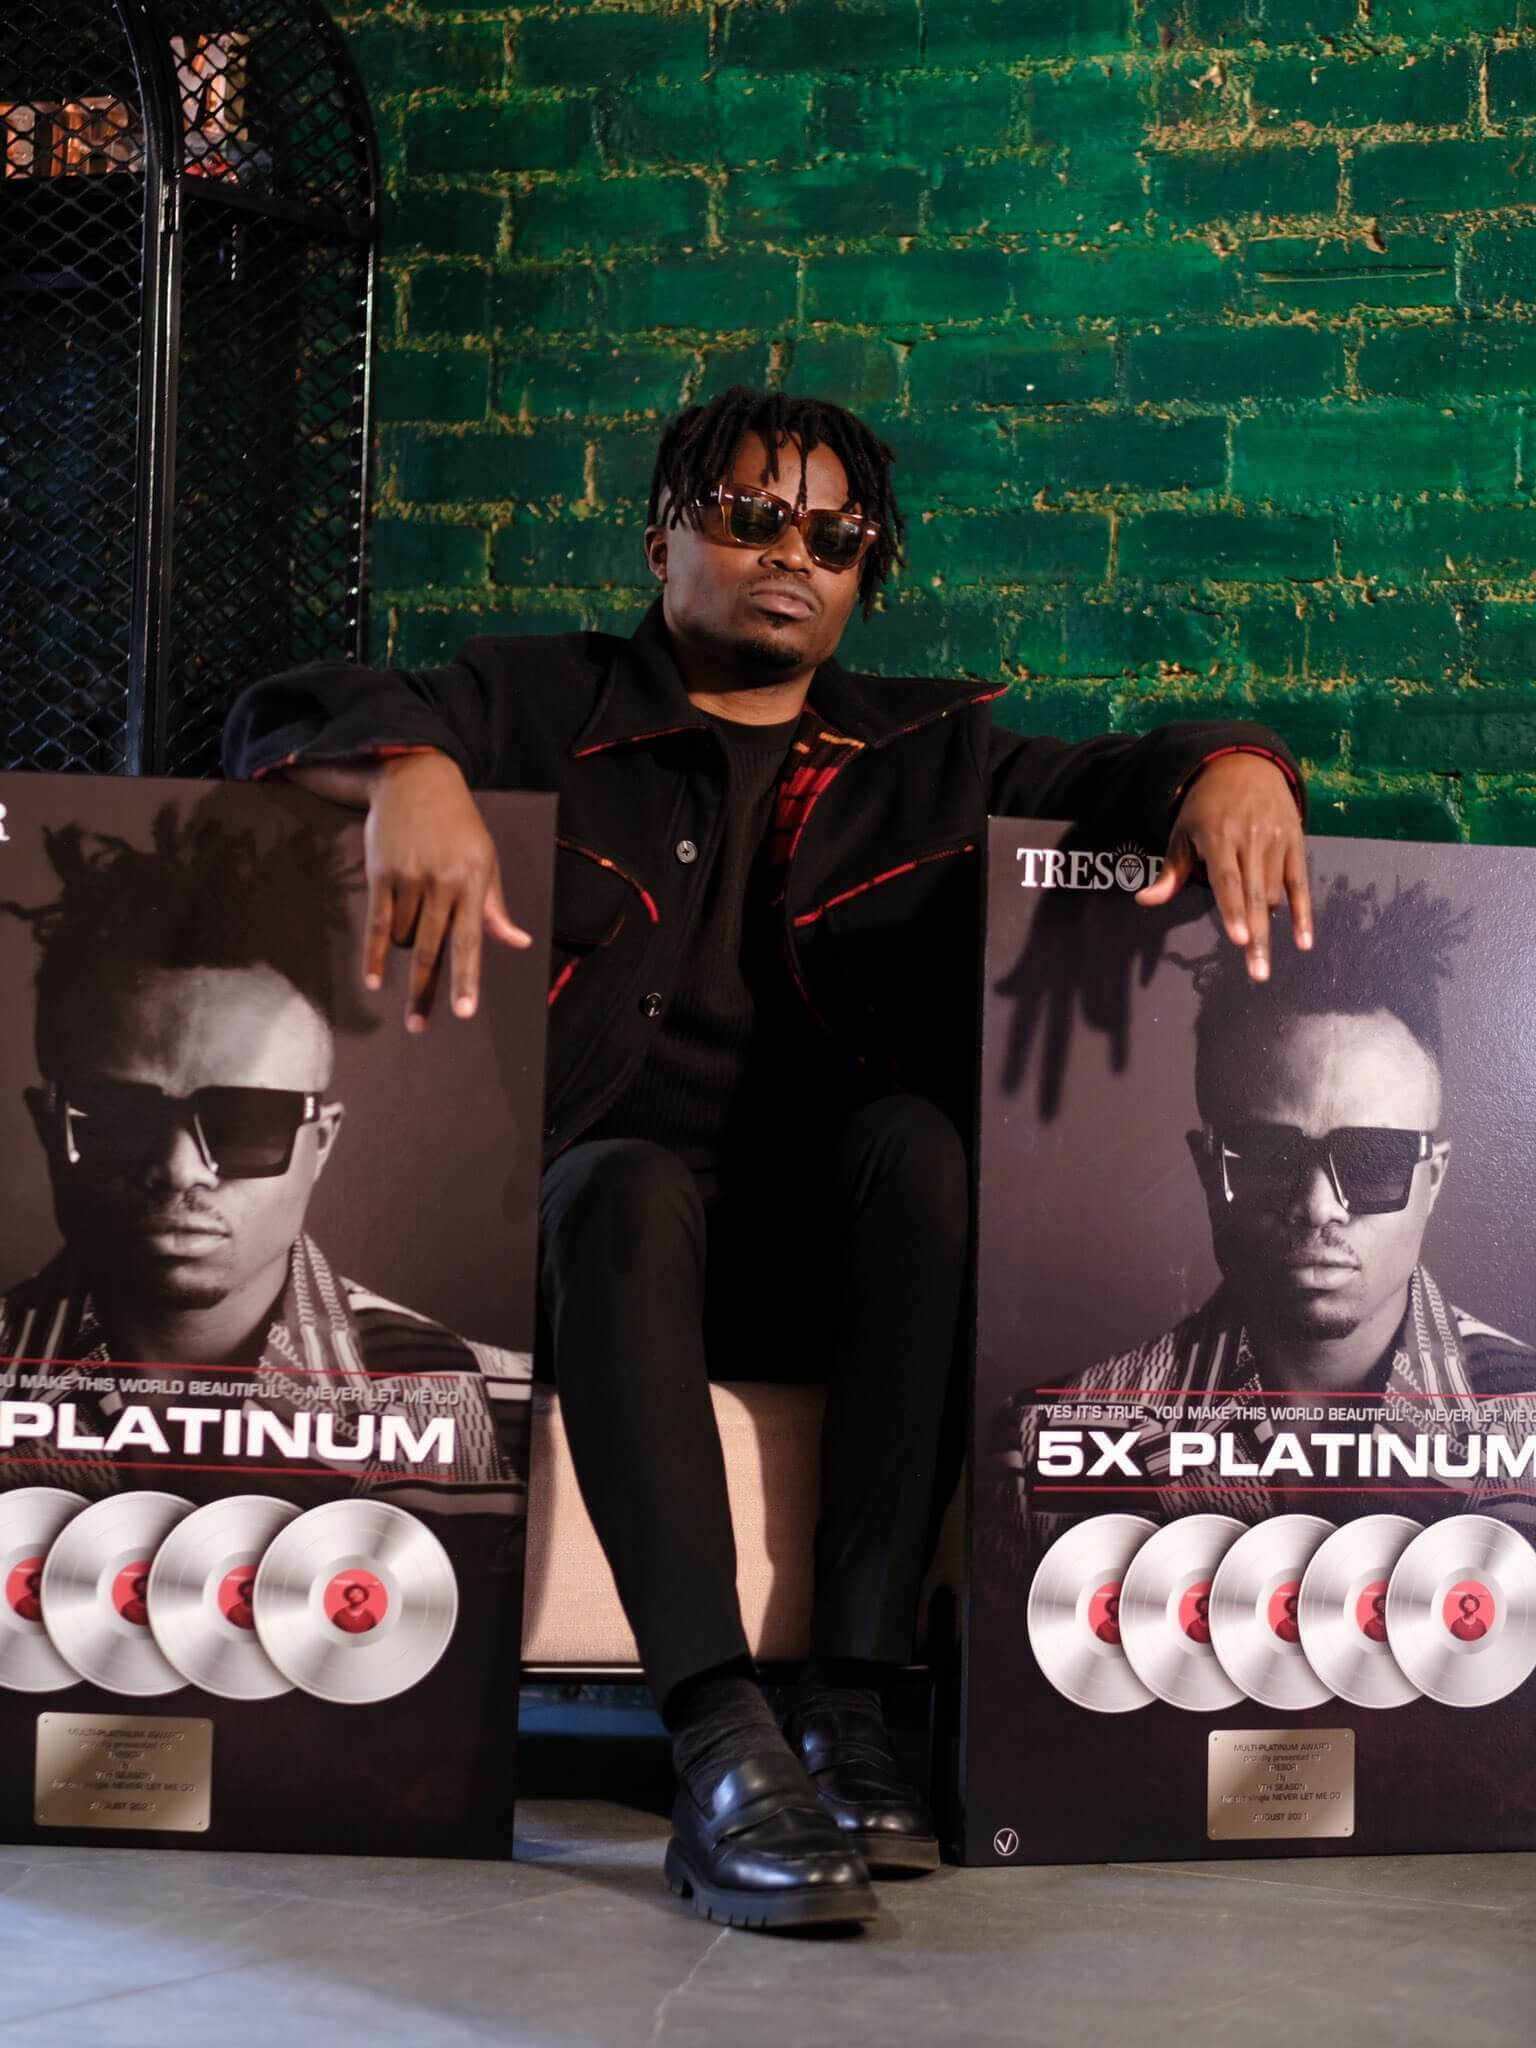 TRESOR certified 5X Platinum